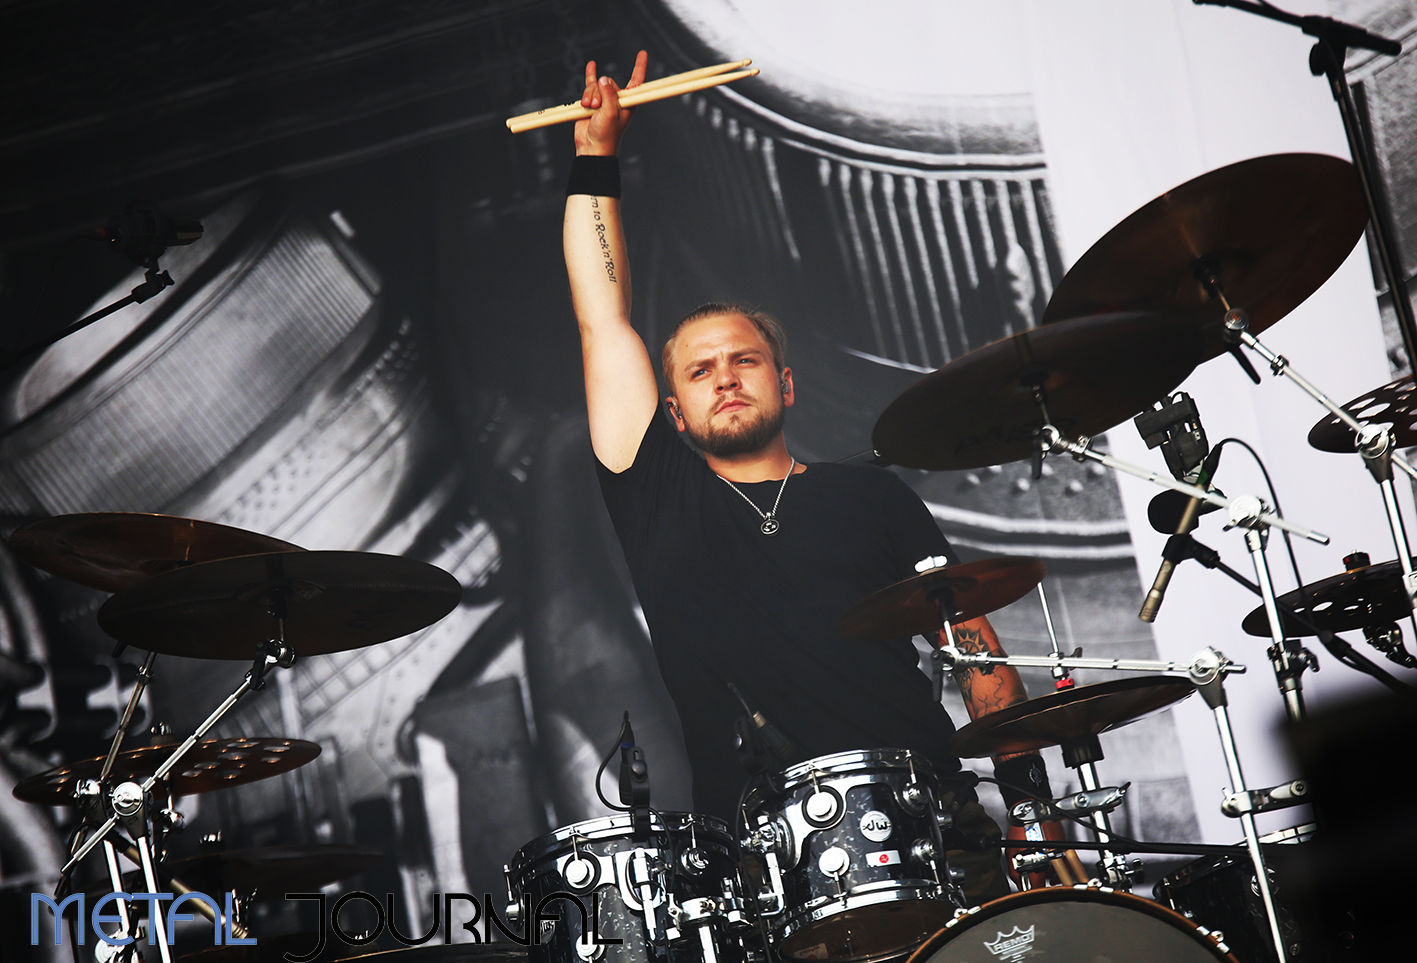 udo - metal journal rock fest barcelona 2019 pic 2